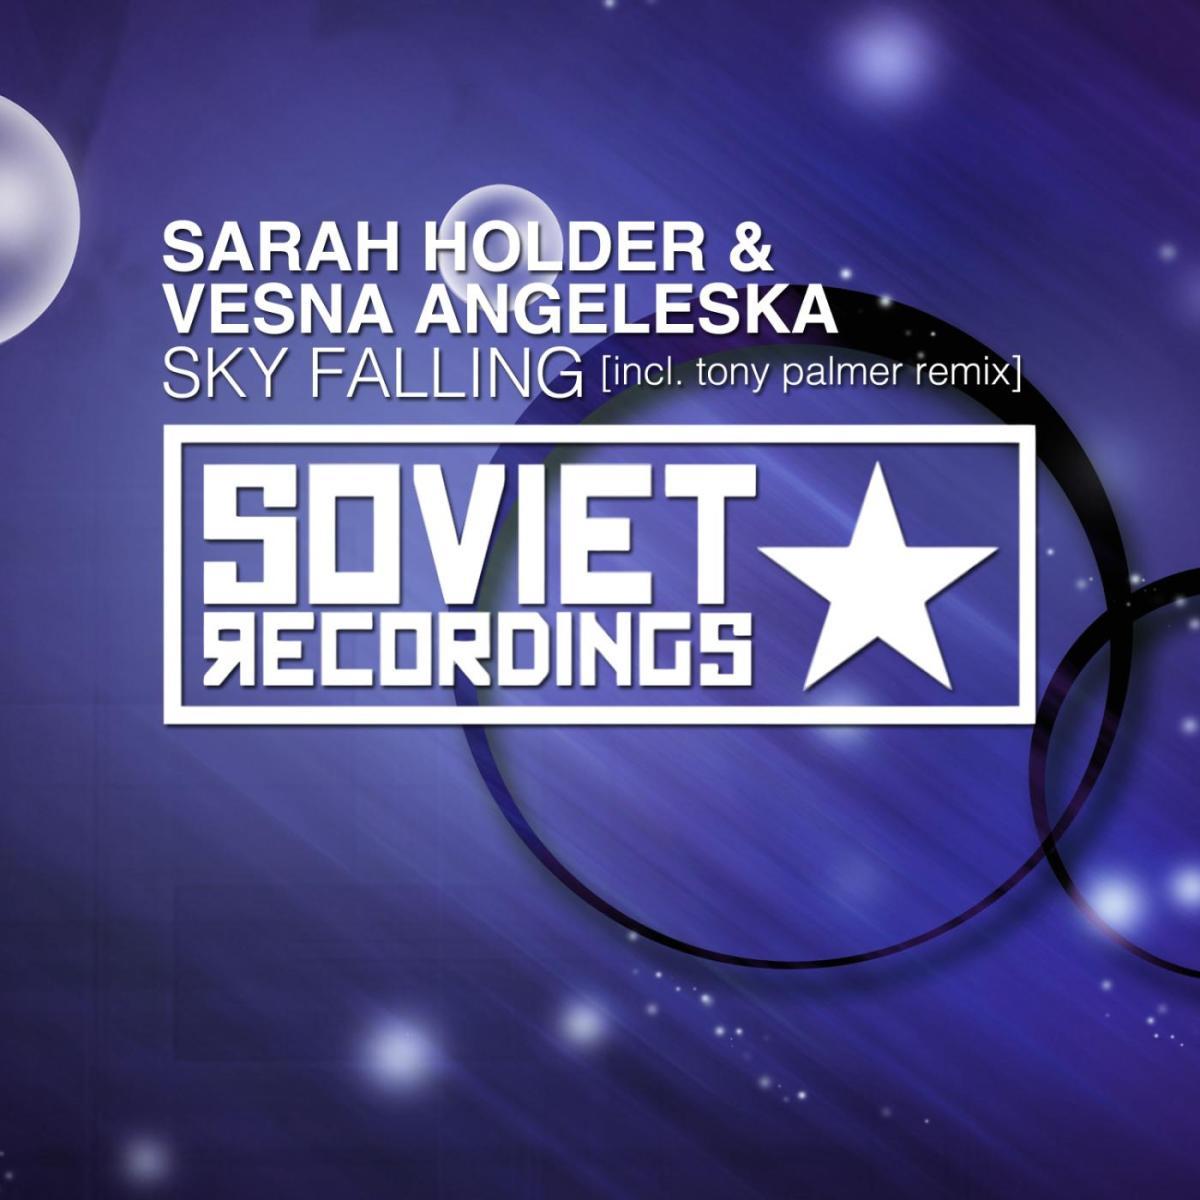 Sarah Holder & Vesna Angeleska - Sky Falling